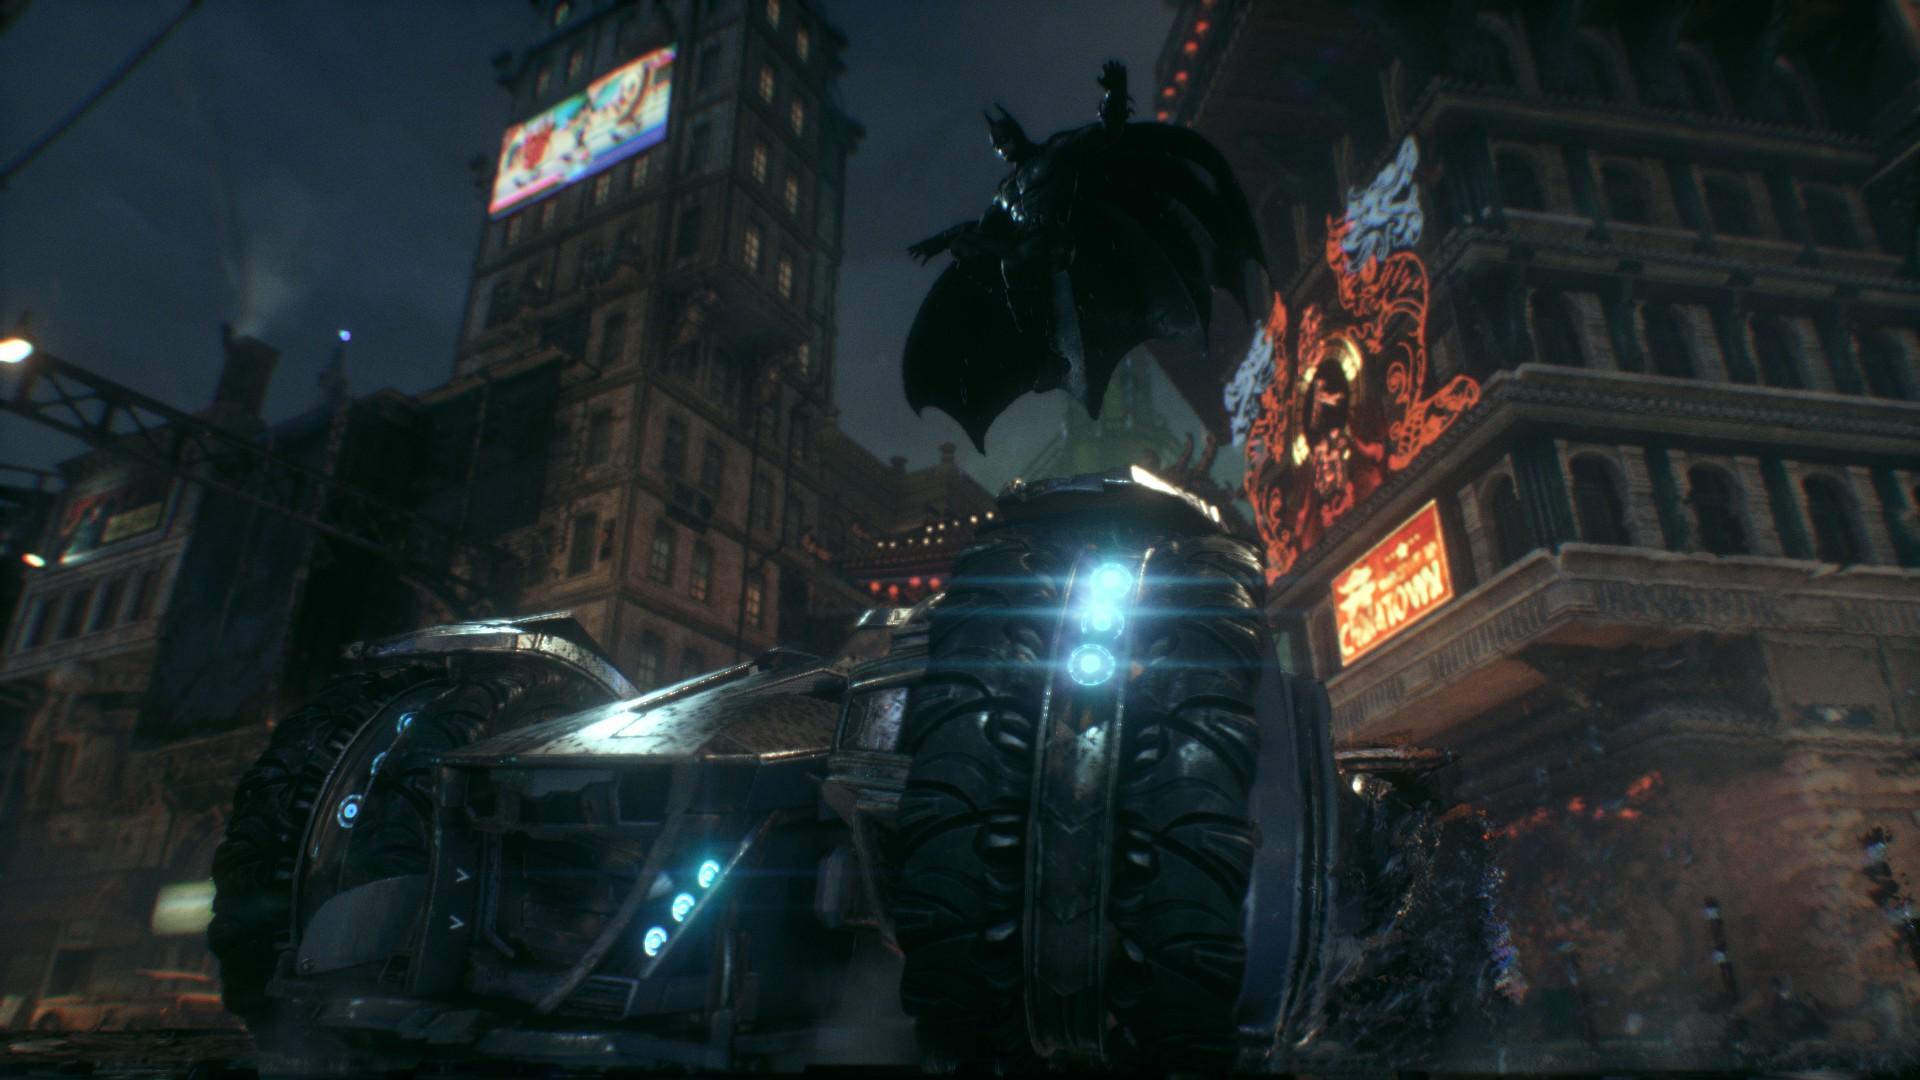 The Refined Geek » Batman: Arkham Knight: The Day the Dark